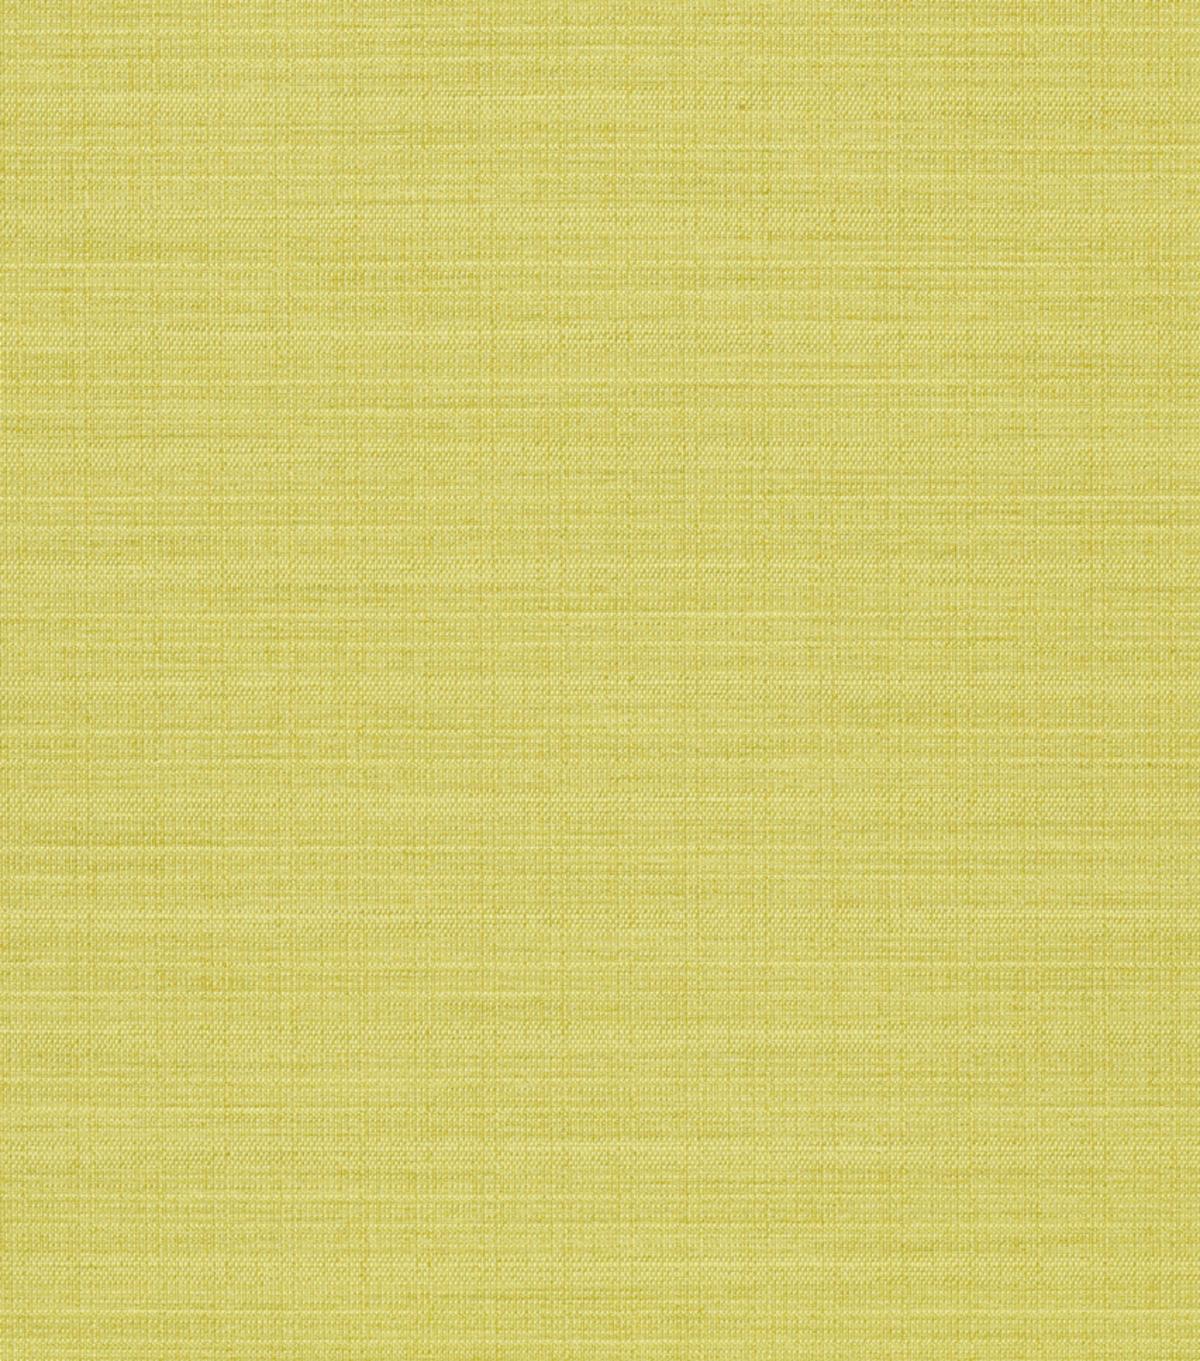 Crypton Upholstery Decor Fabric 54 U0022 Boca Sweet Pea